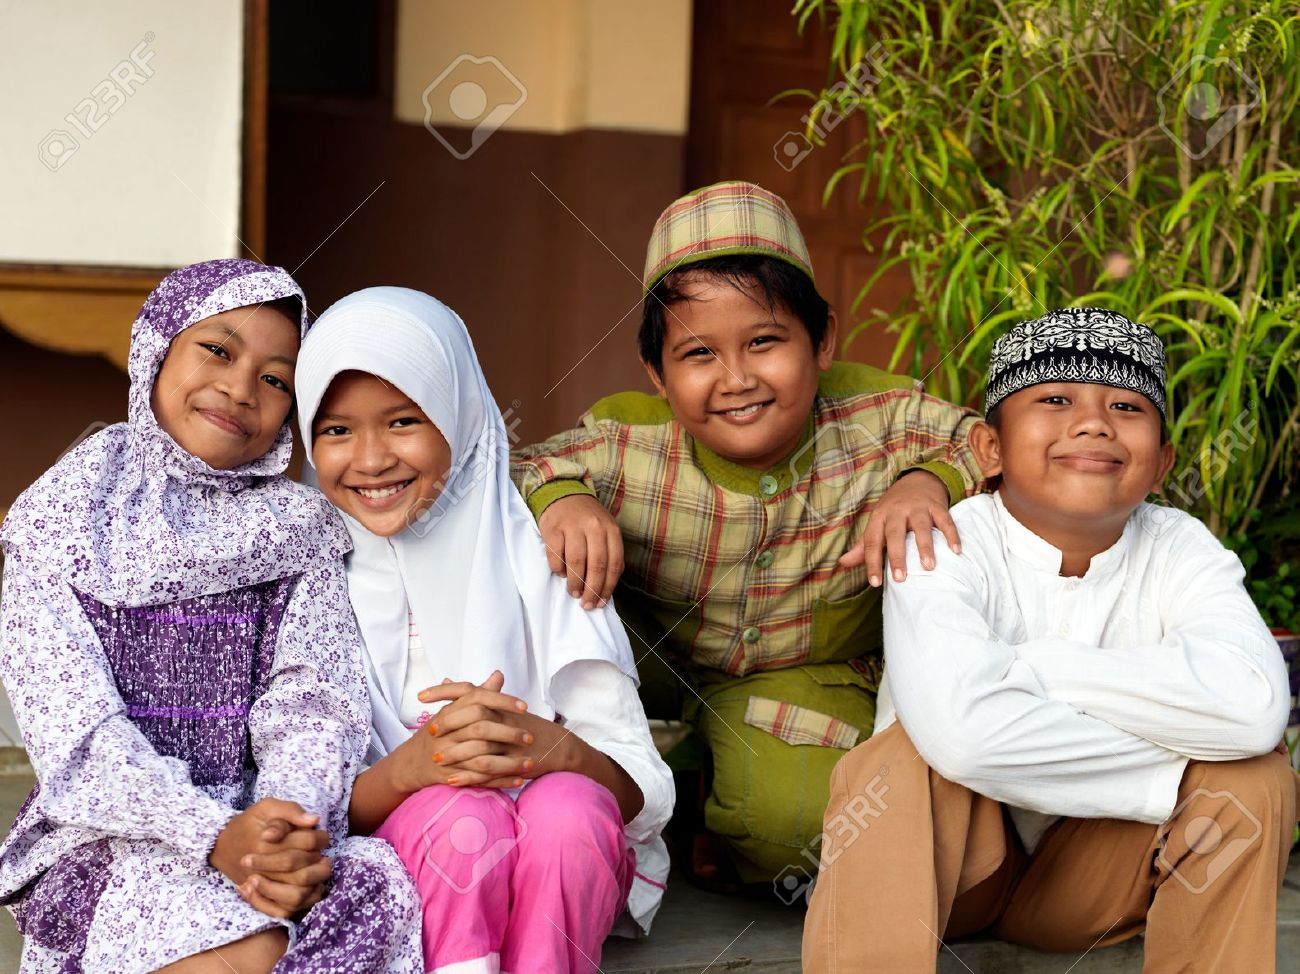 Image result for saudi muslim children